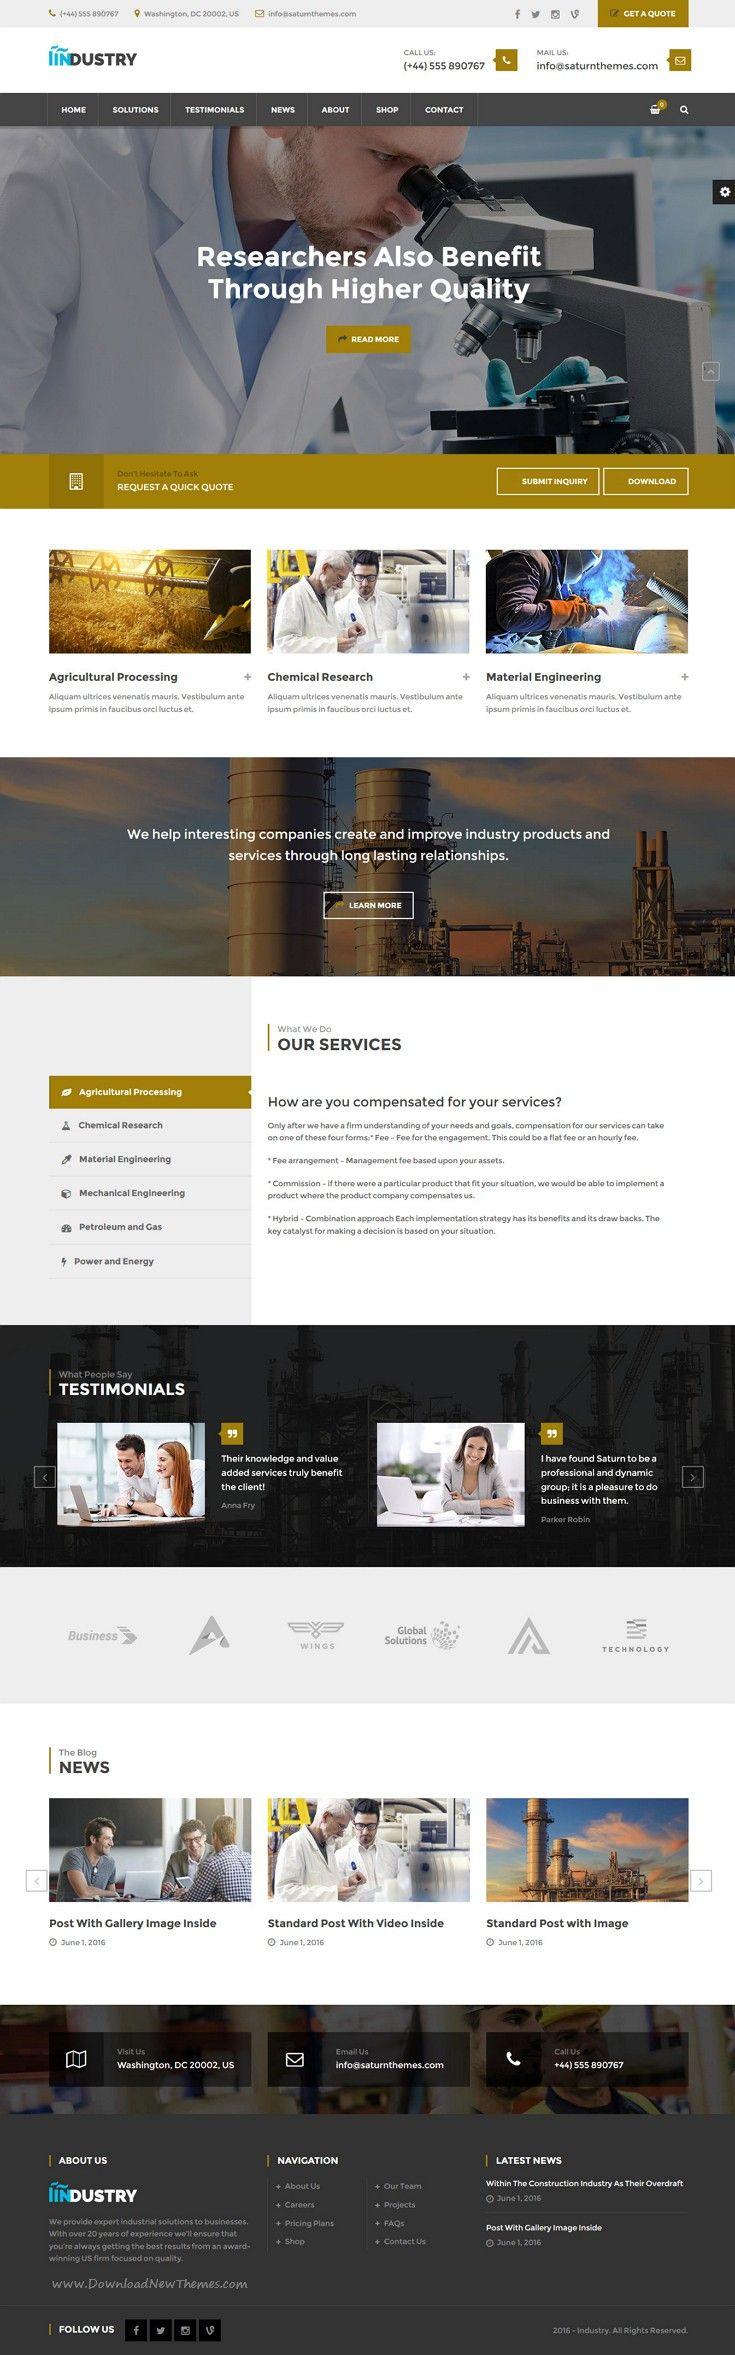 7factory Industrial Manufacturing Psd Template Web Layout Design Web Design Website Design Inspiration